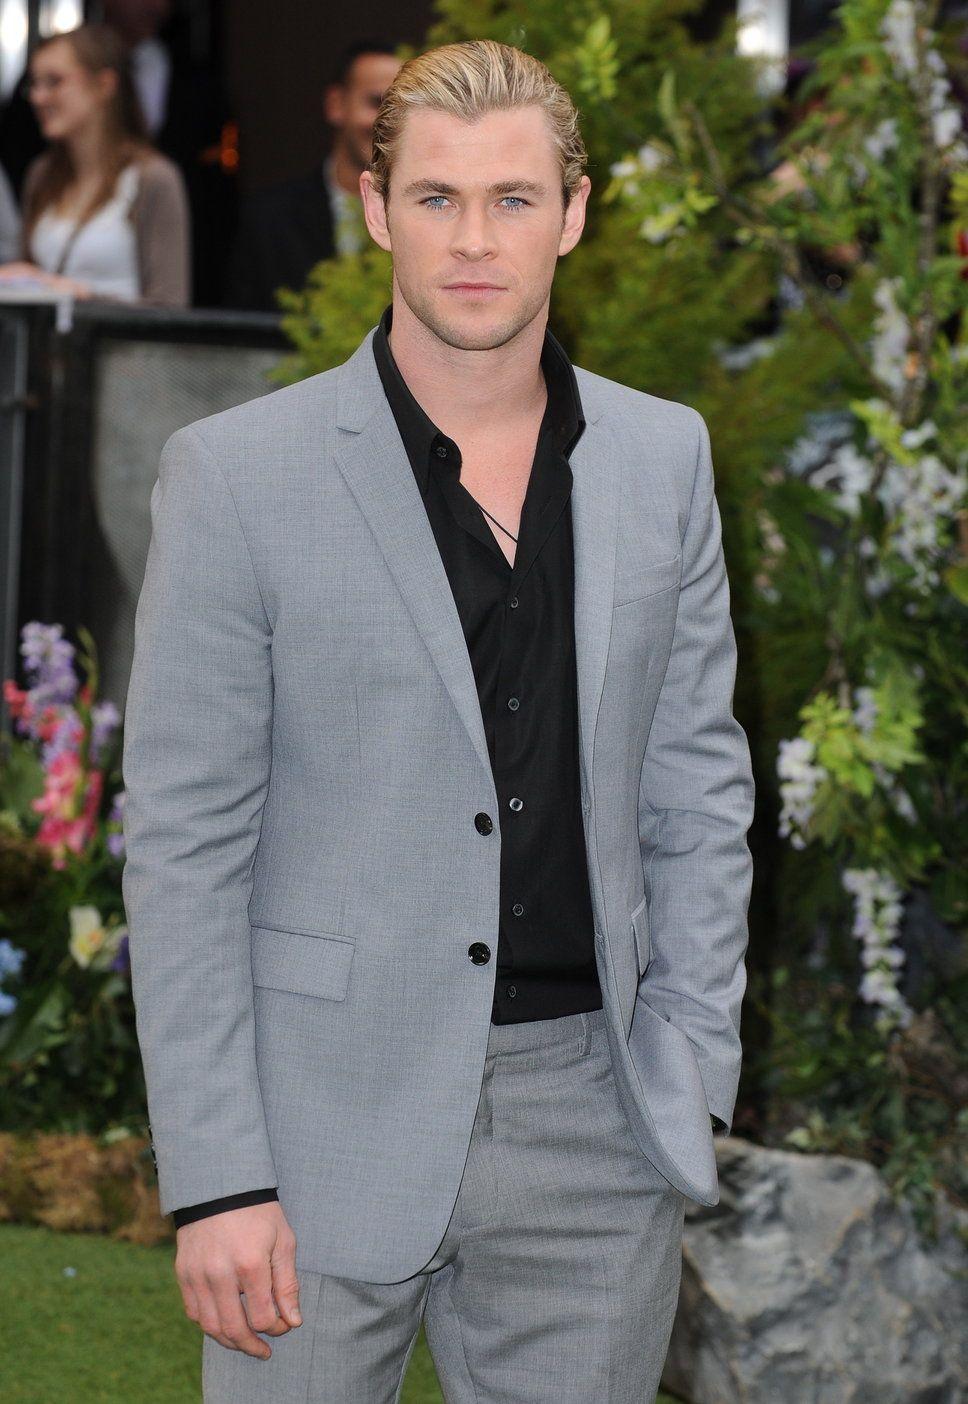 Gray Suit Ideas For Men\'s Fashion | Grey suit black shirt, Dark grey ...